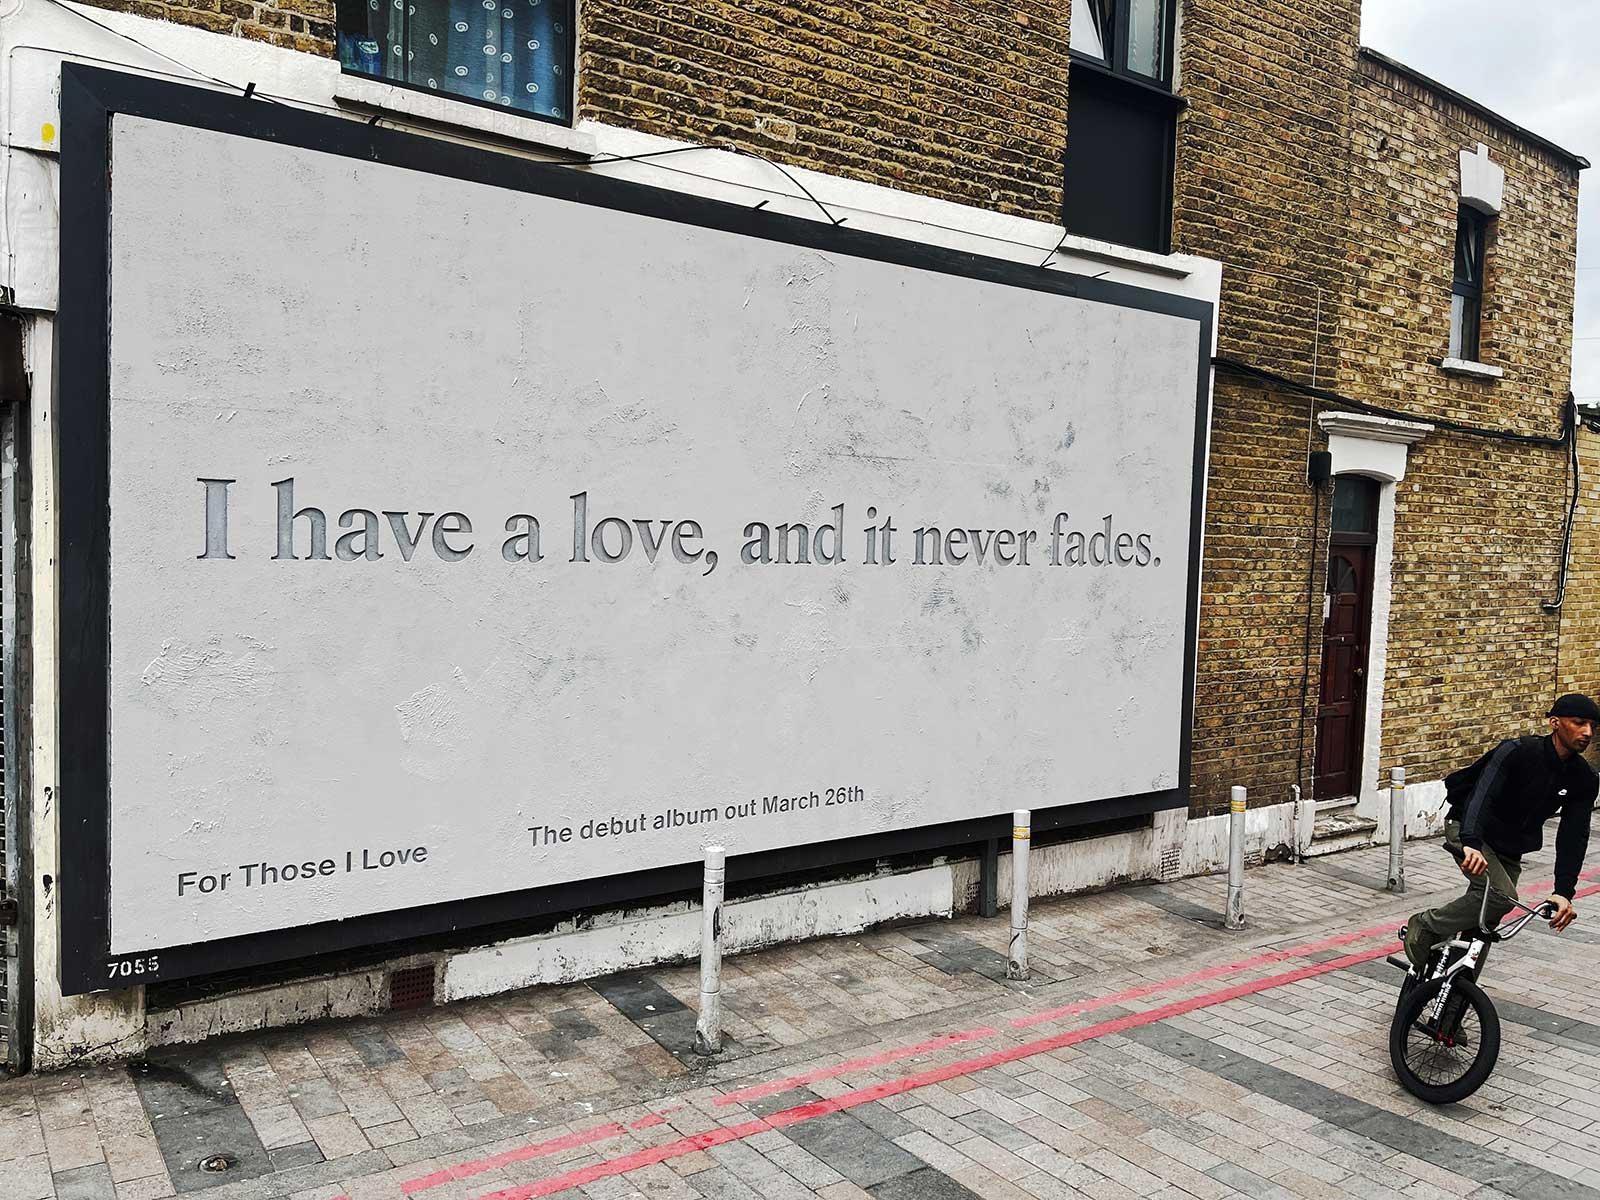 For those I love: Debut album - Creative billboards - DIABOLICAL